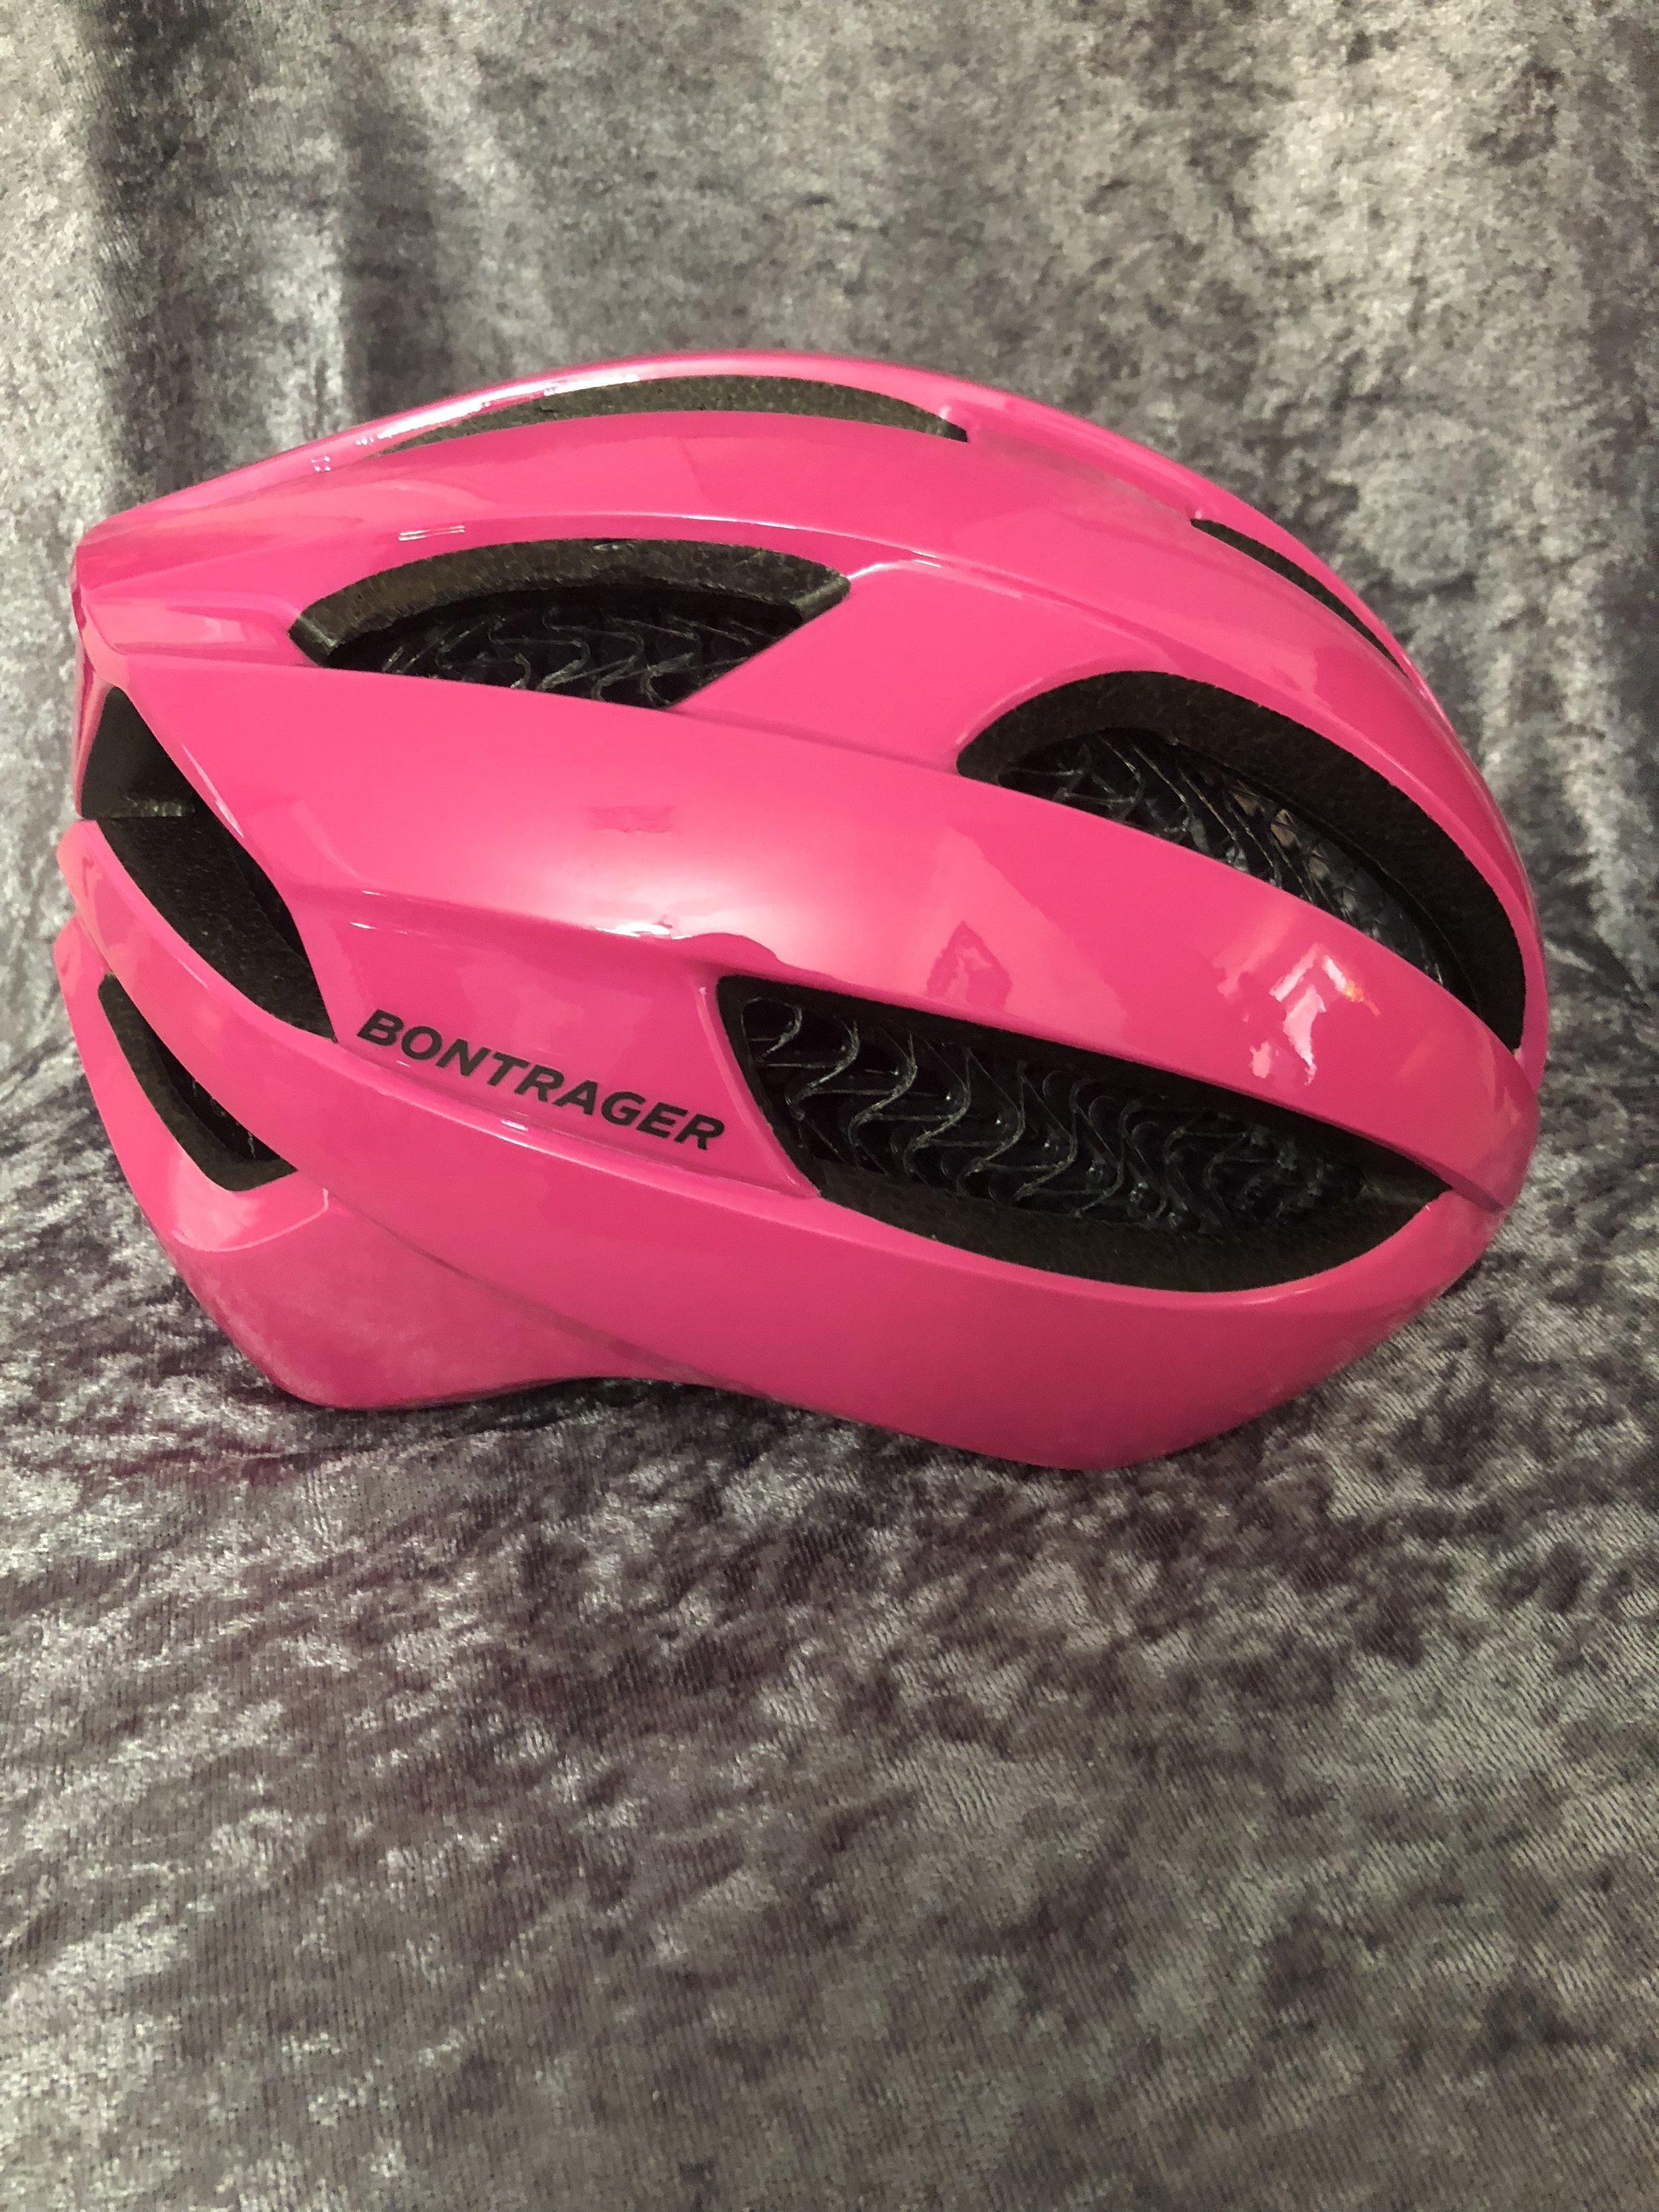 Bontrager Specter Helmet Pink Side View